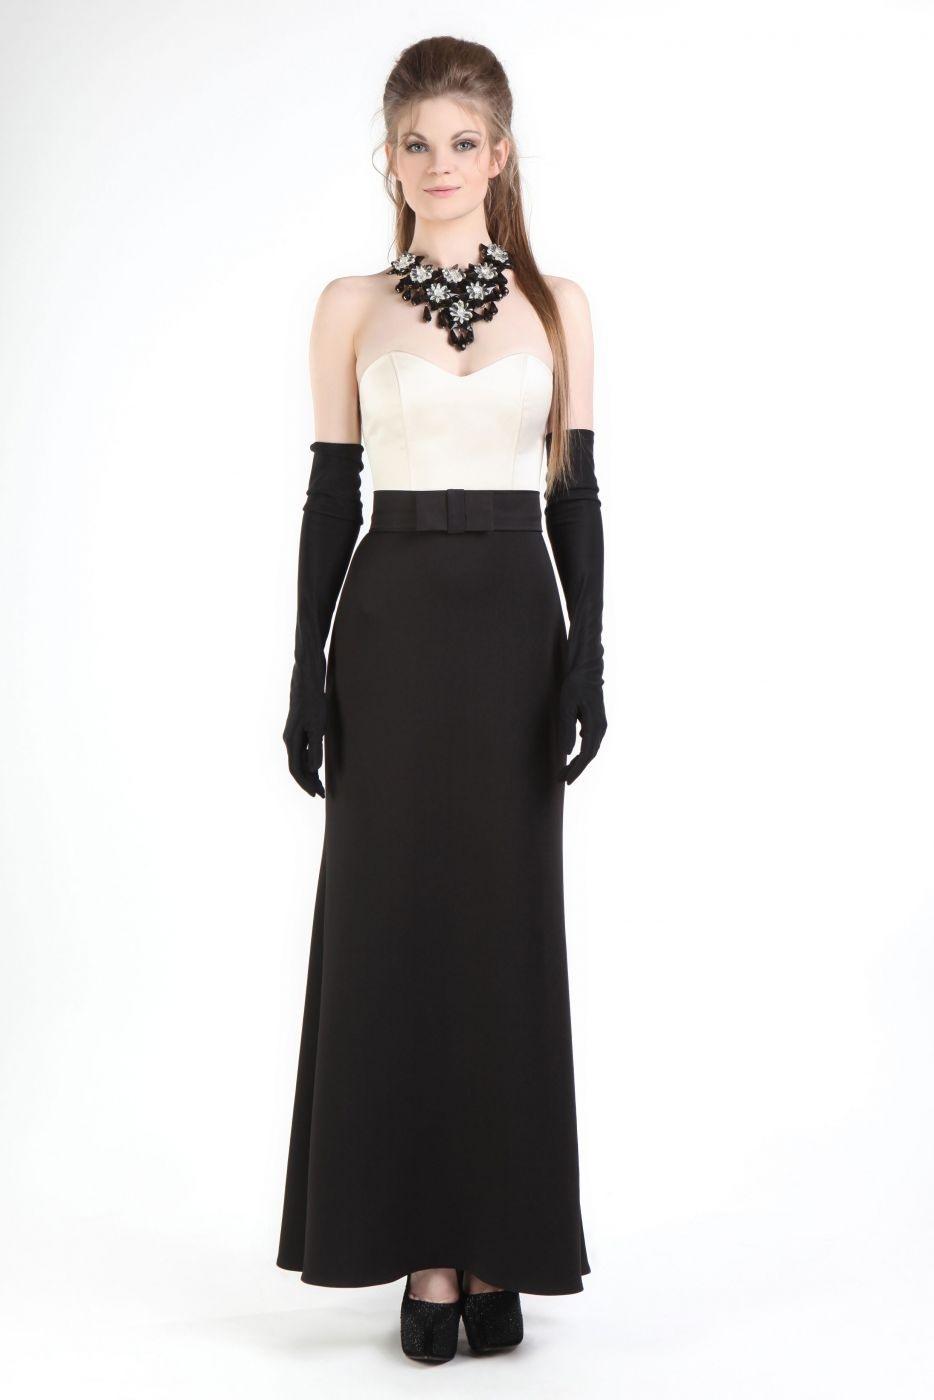 20 Top Abendkleid Schwarz Weiß Lang BoutiqueFormal Einzigartig Abendkleid Schwarz Weiß Lang Boutique